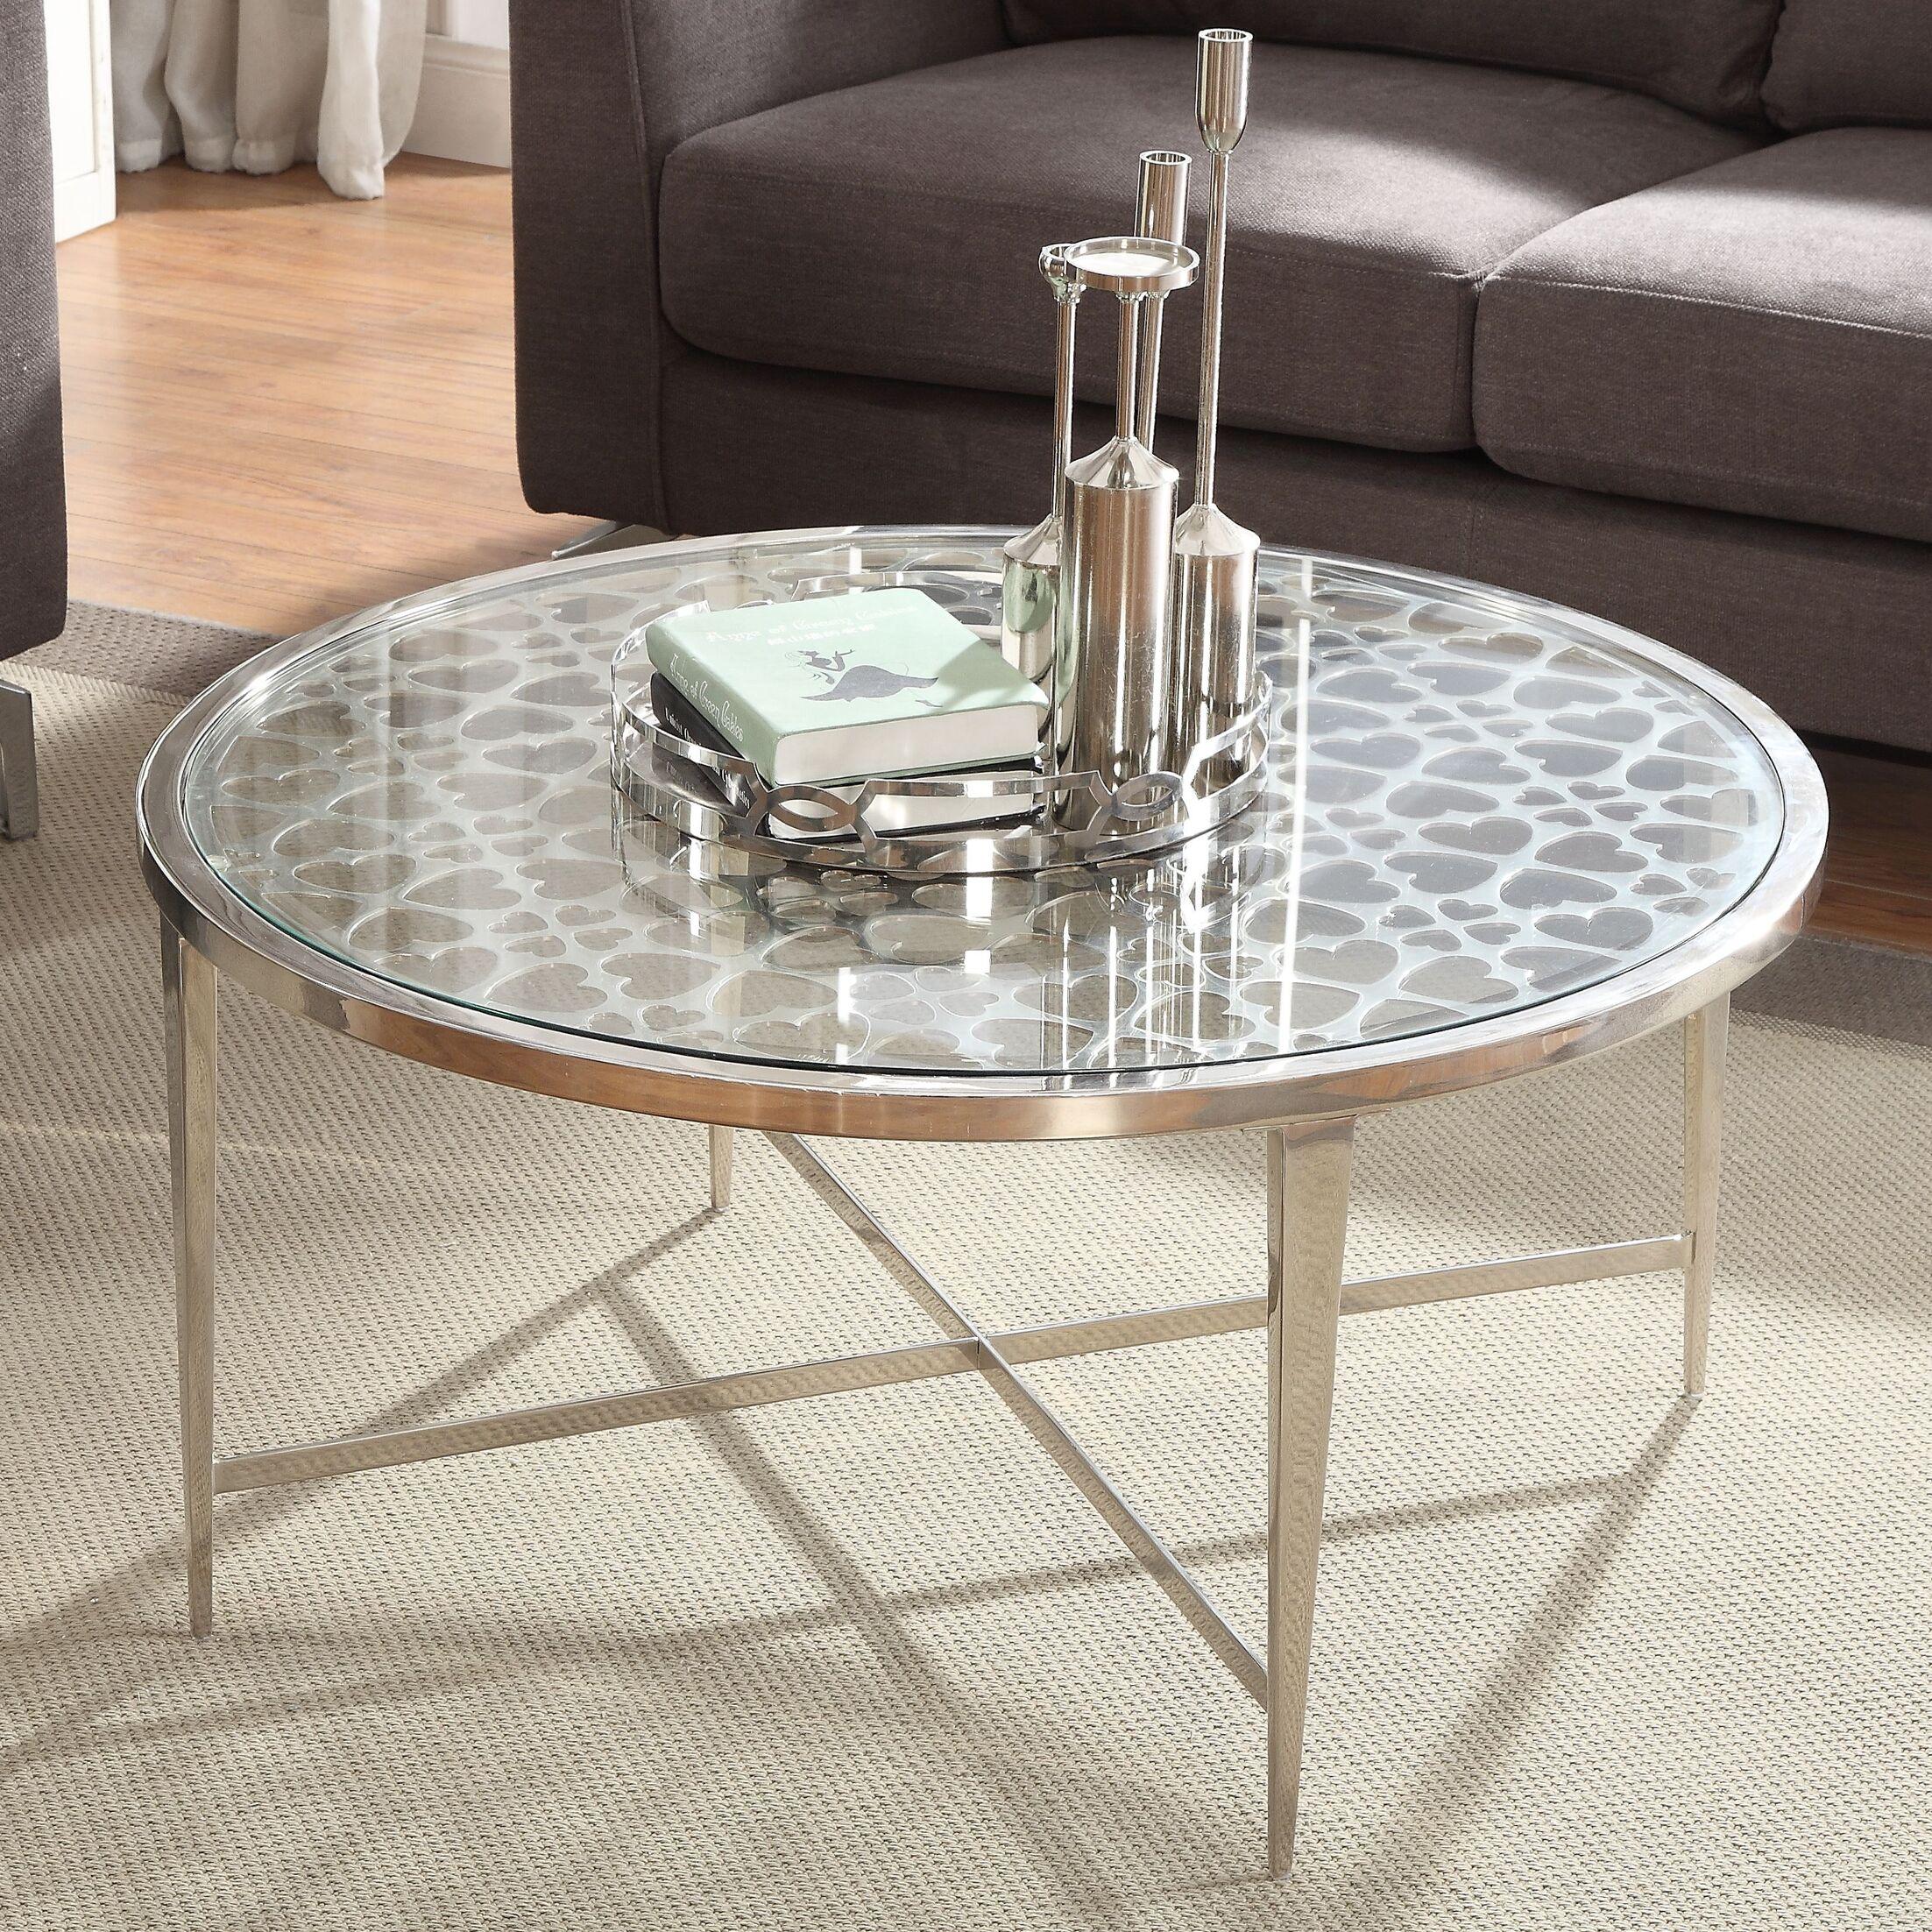 Lossett Coffee Table